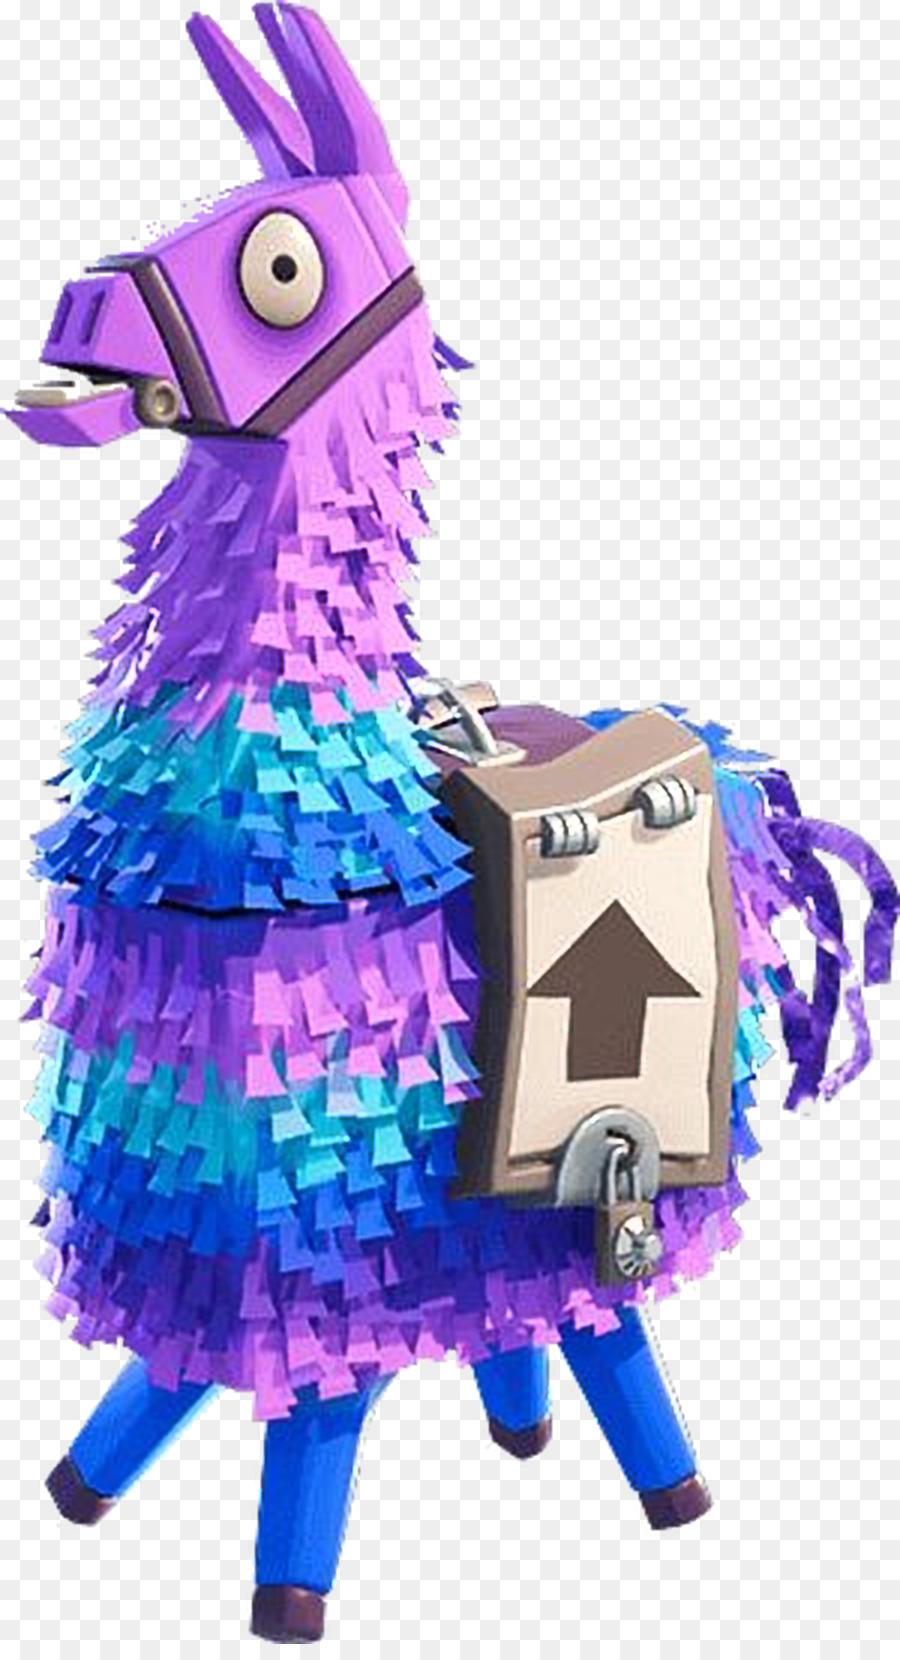 fortnite llama clipart Fortnite Battle Royale Llama